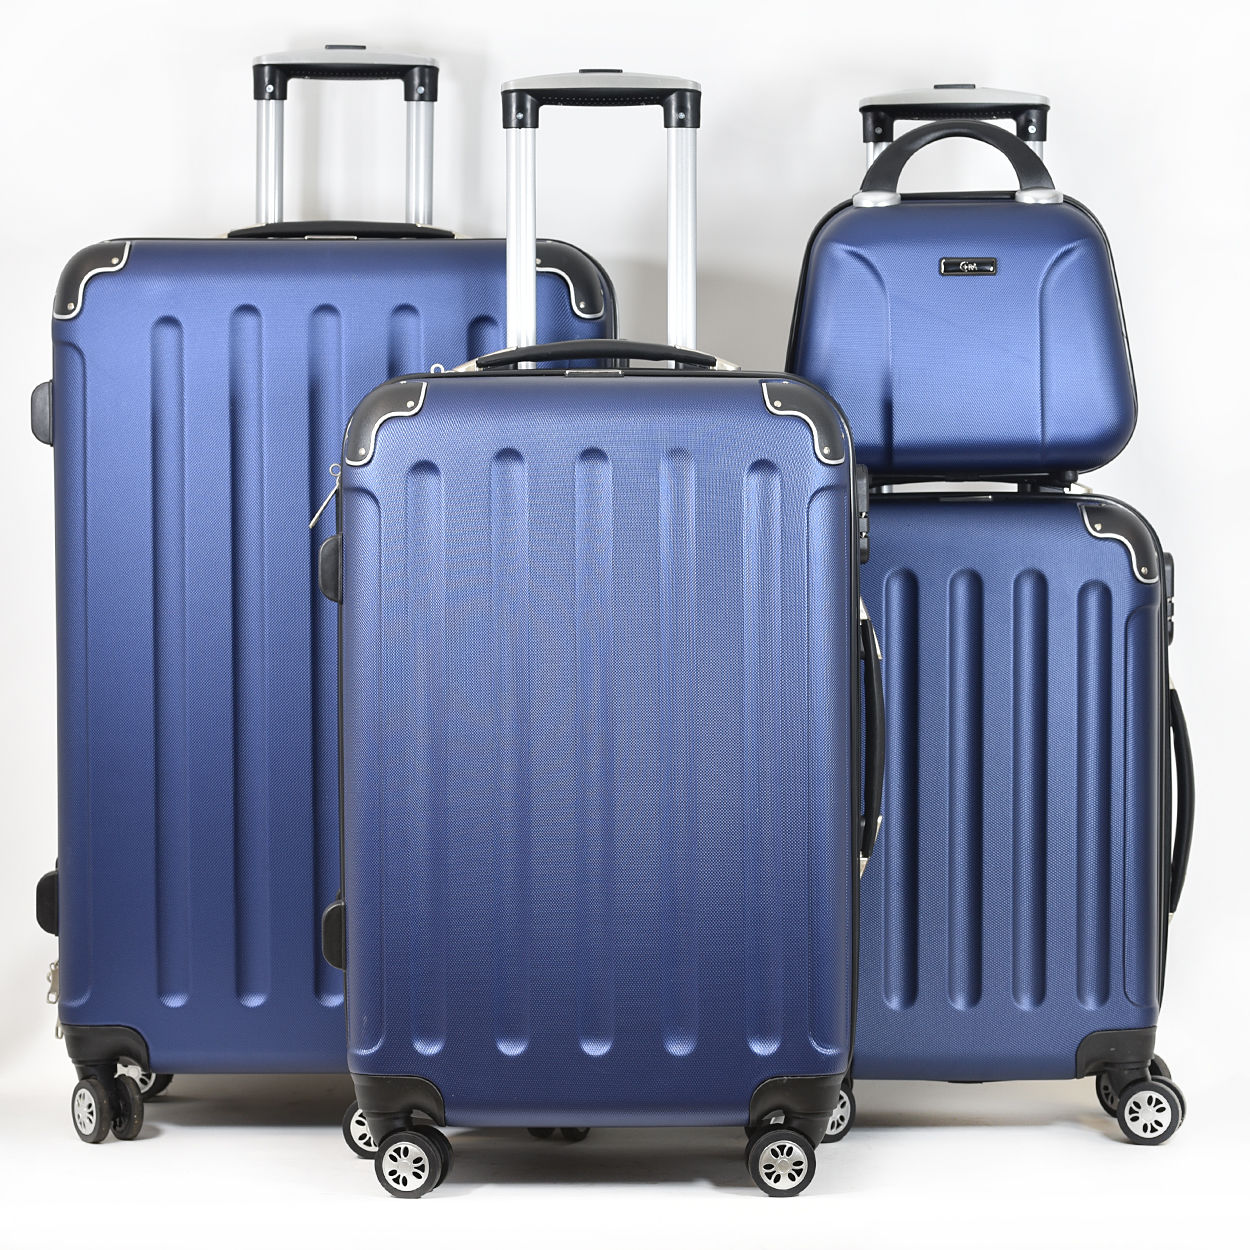 Koffer Trolley Reisekoffer Doppelrollen Hartschale BLAU Kofferset 3 Maße XL-L-M